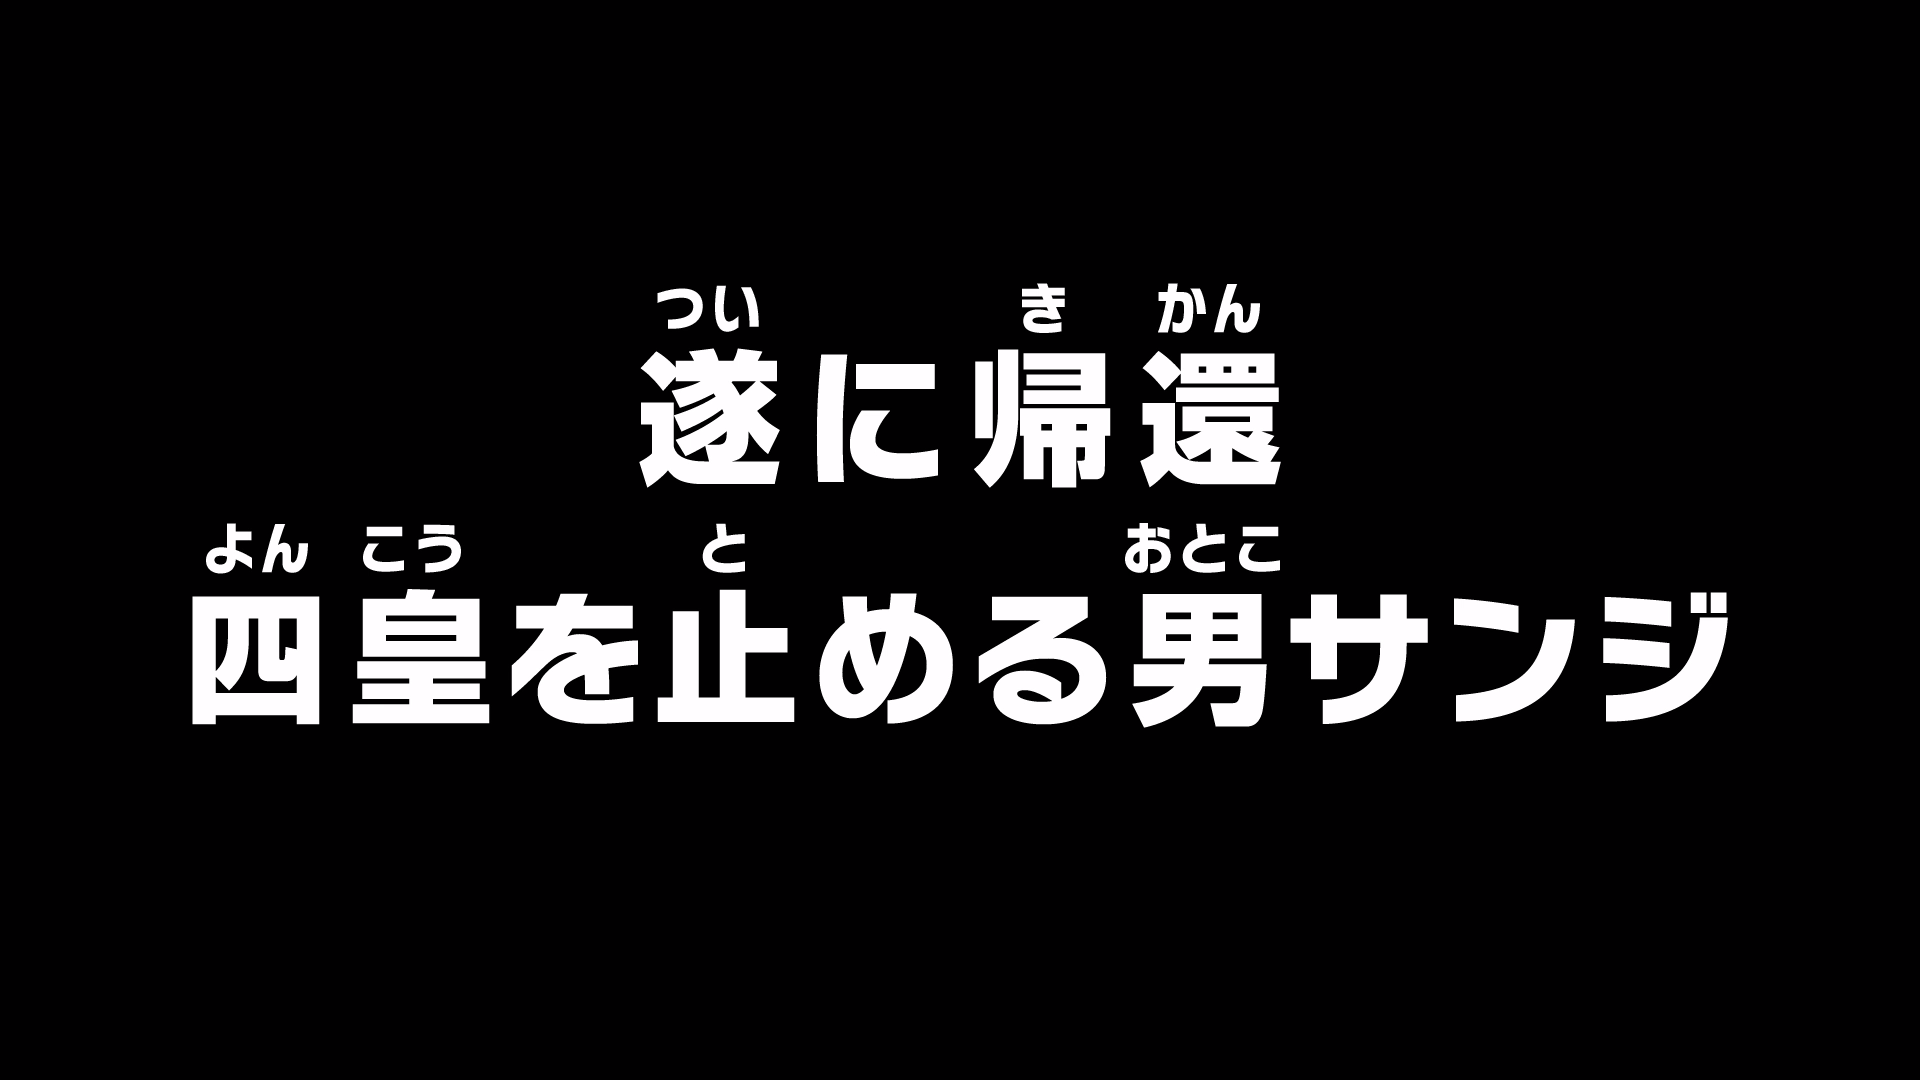 Episode 866